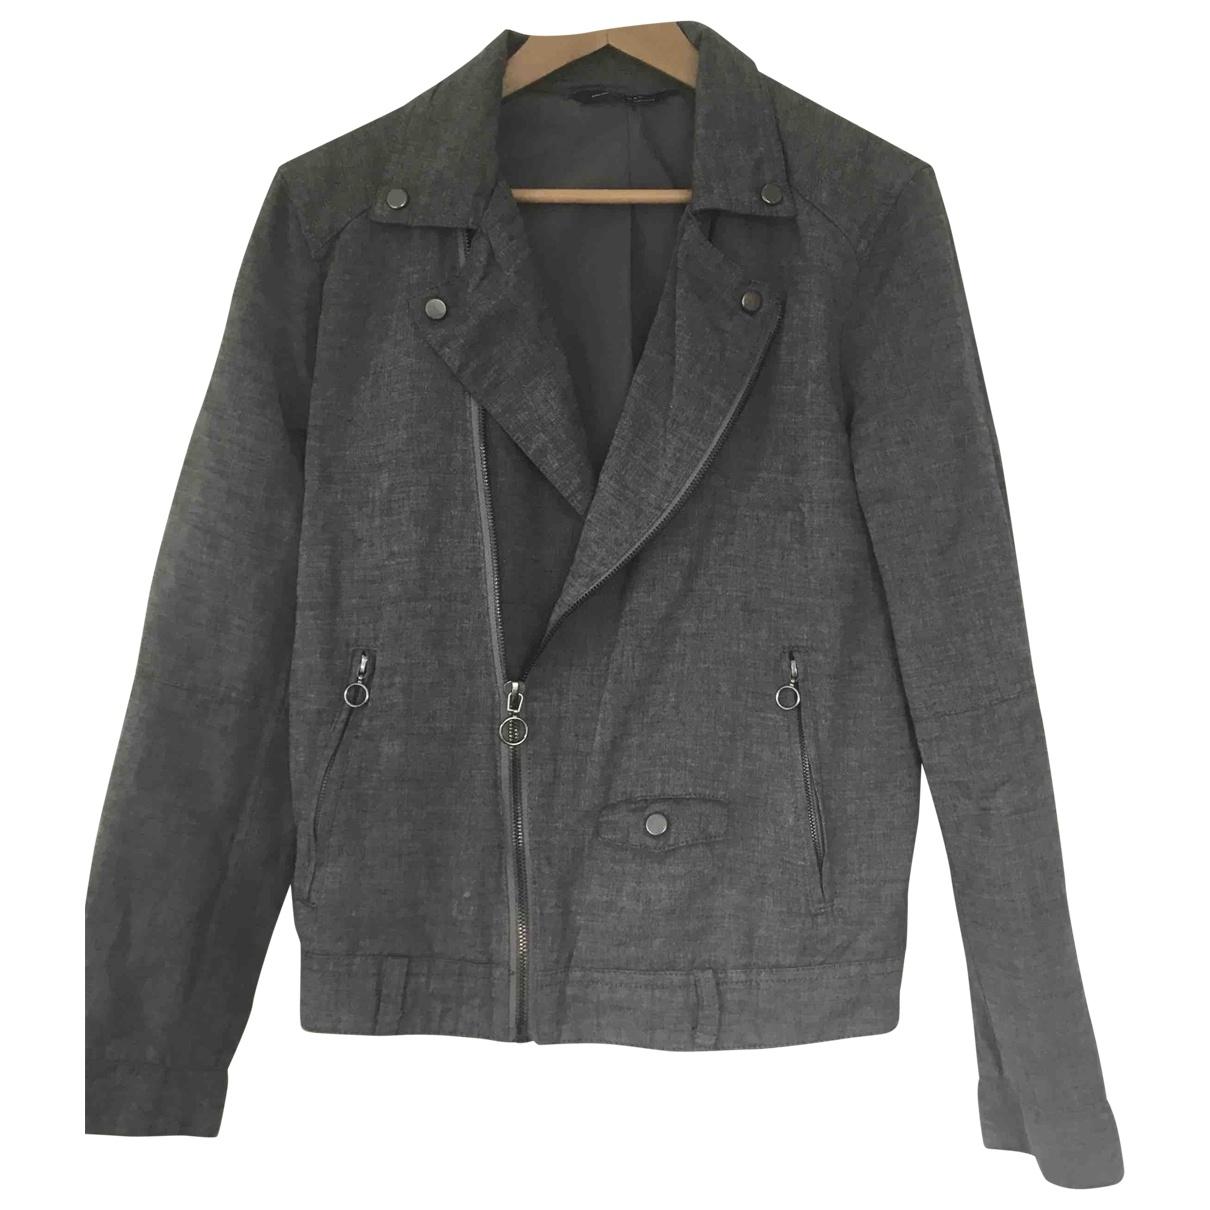 Zara \N Grey jacket  for Men M International